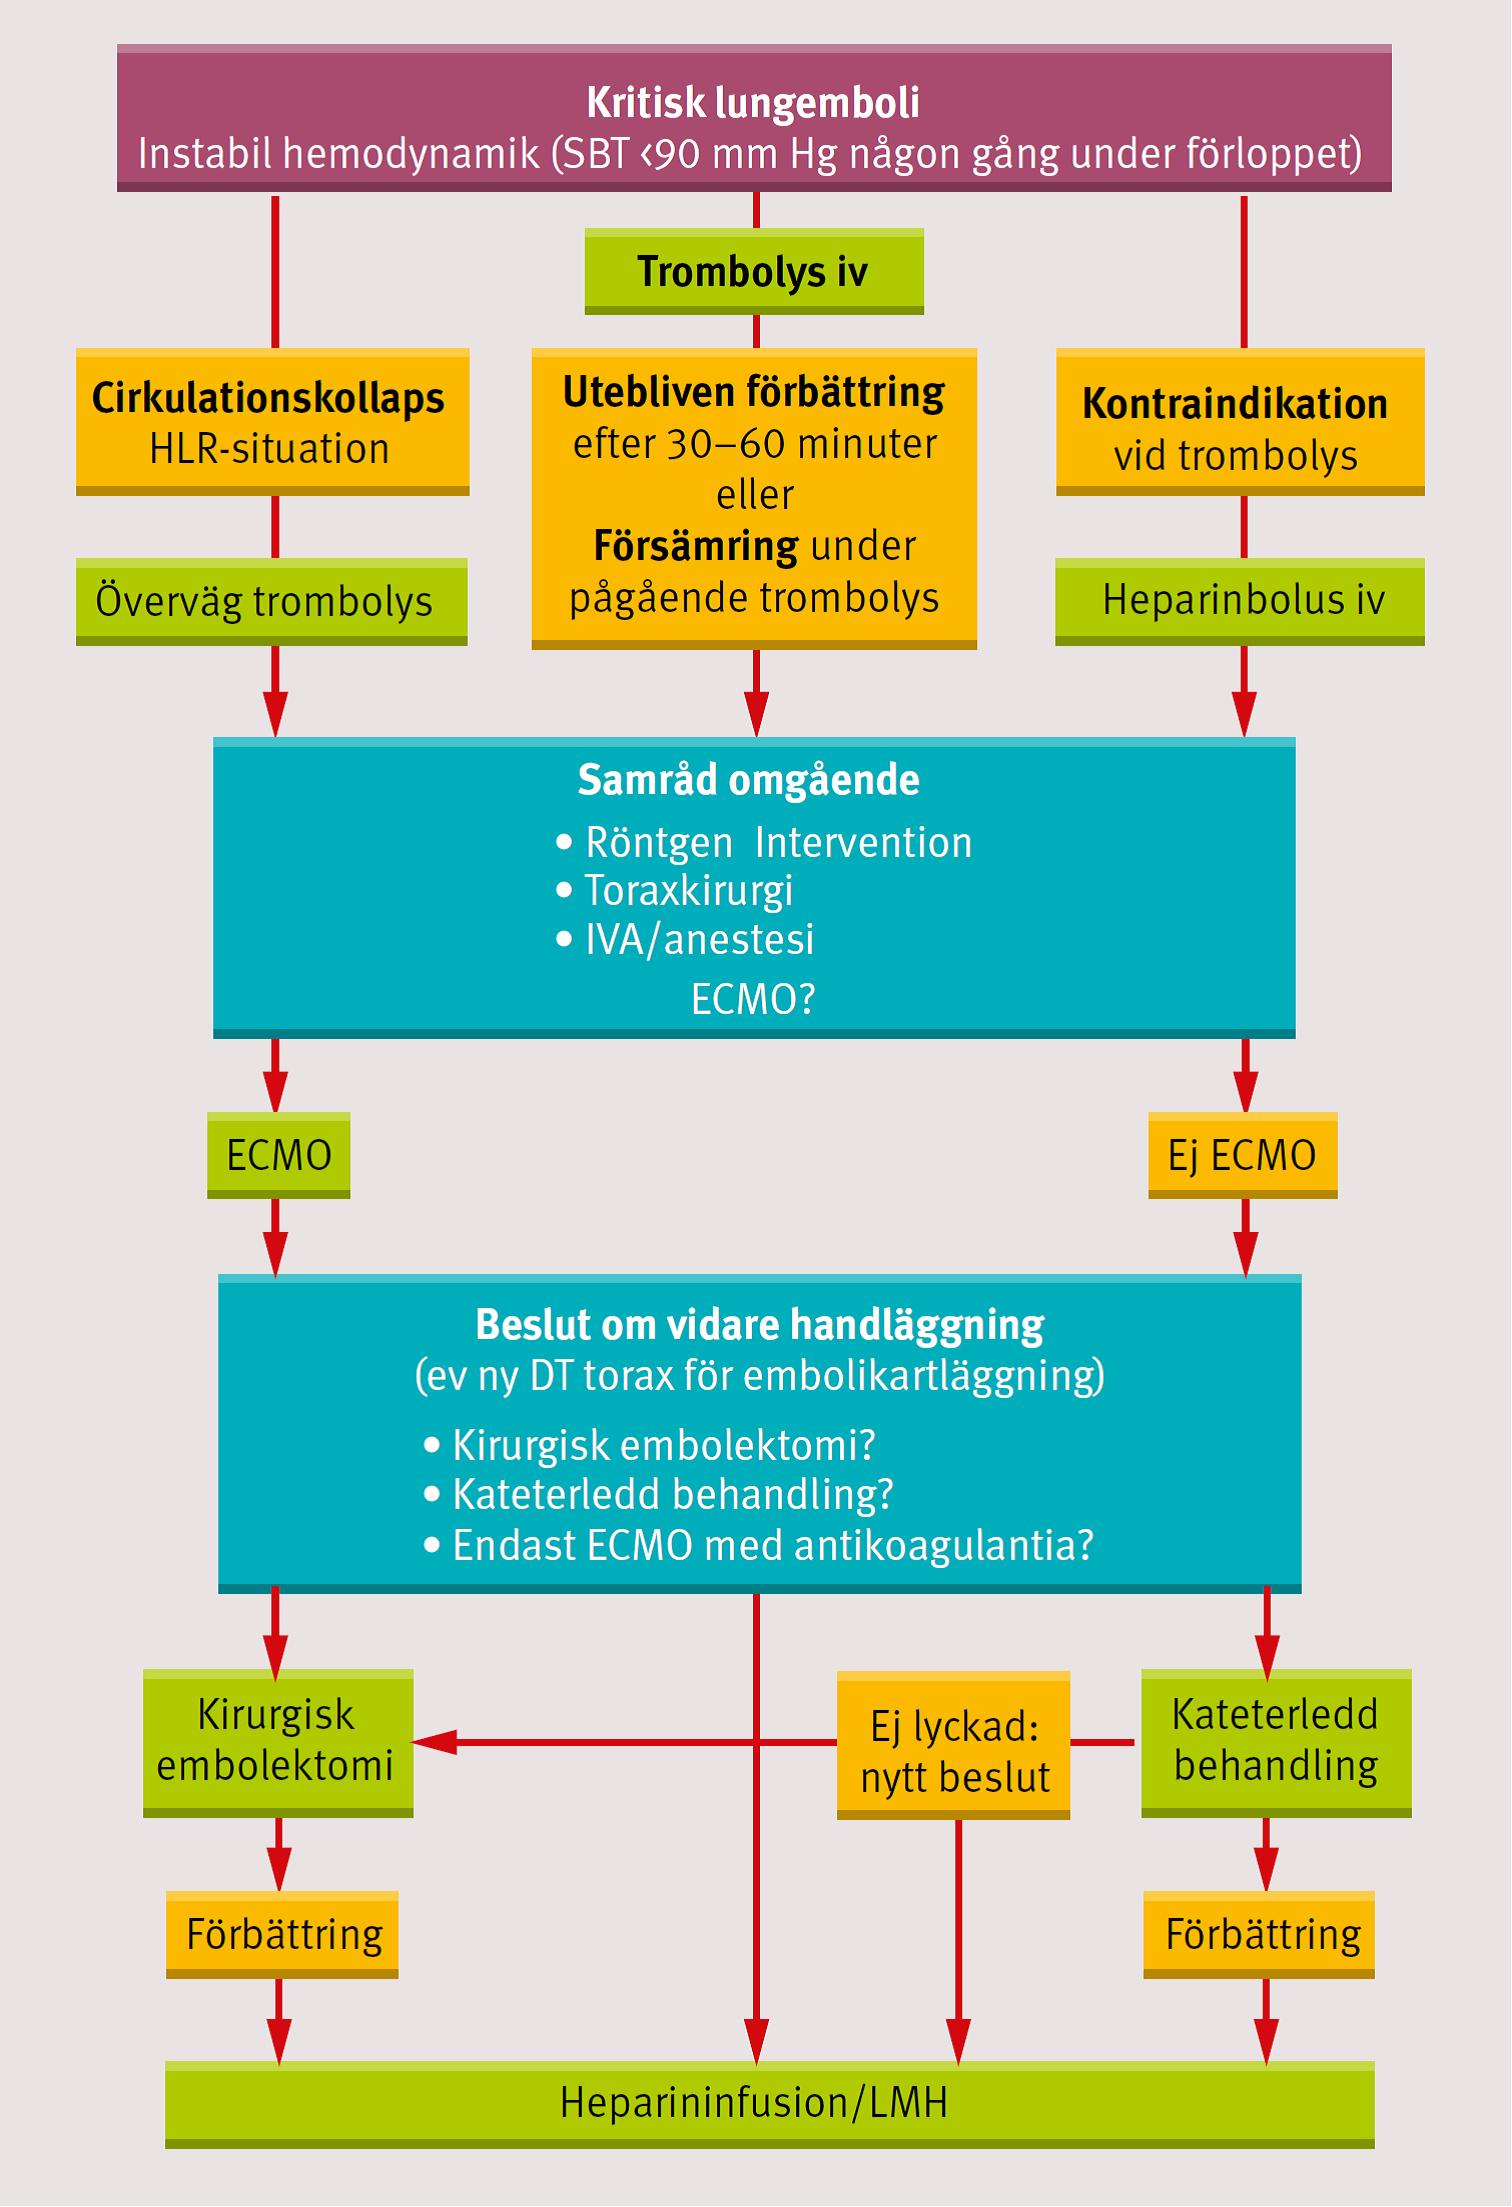 rang et al pharmacology pdf 8th edition